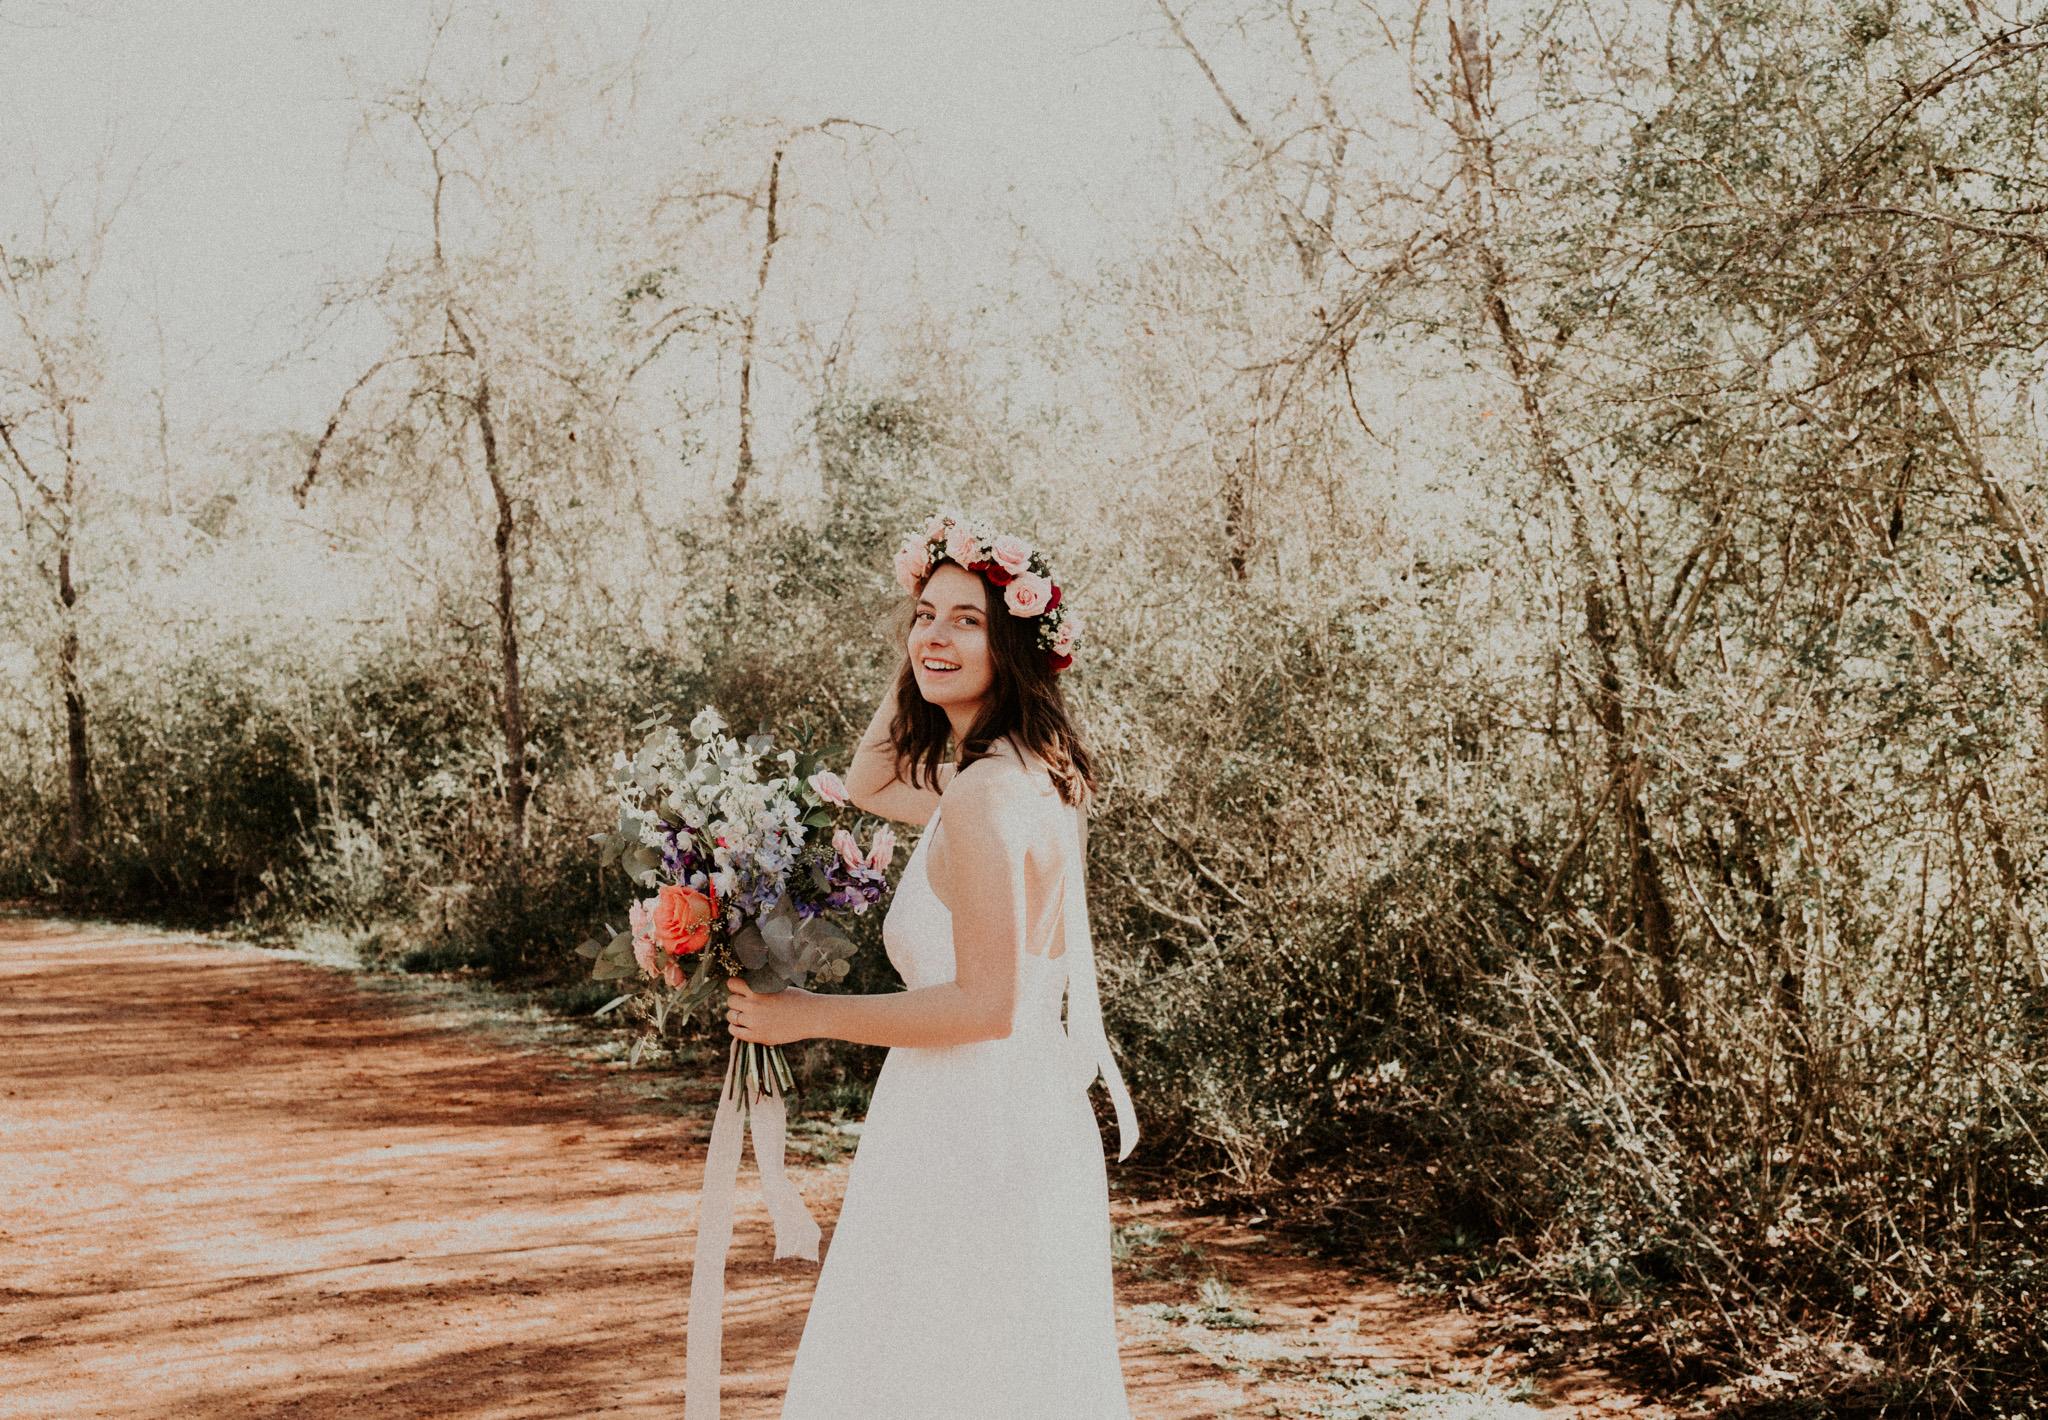 zoe bridals-23.jpg